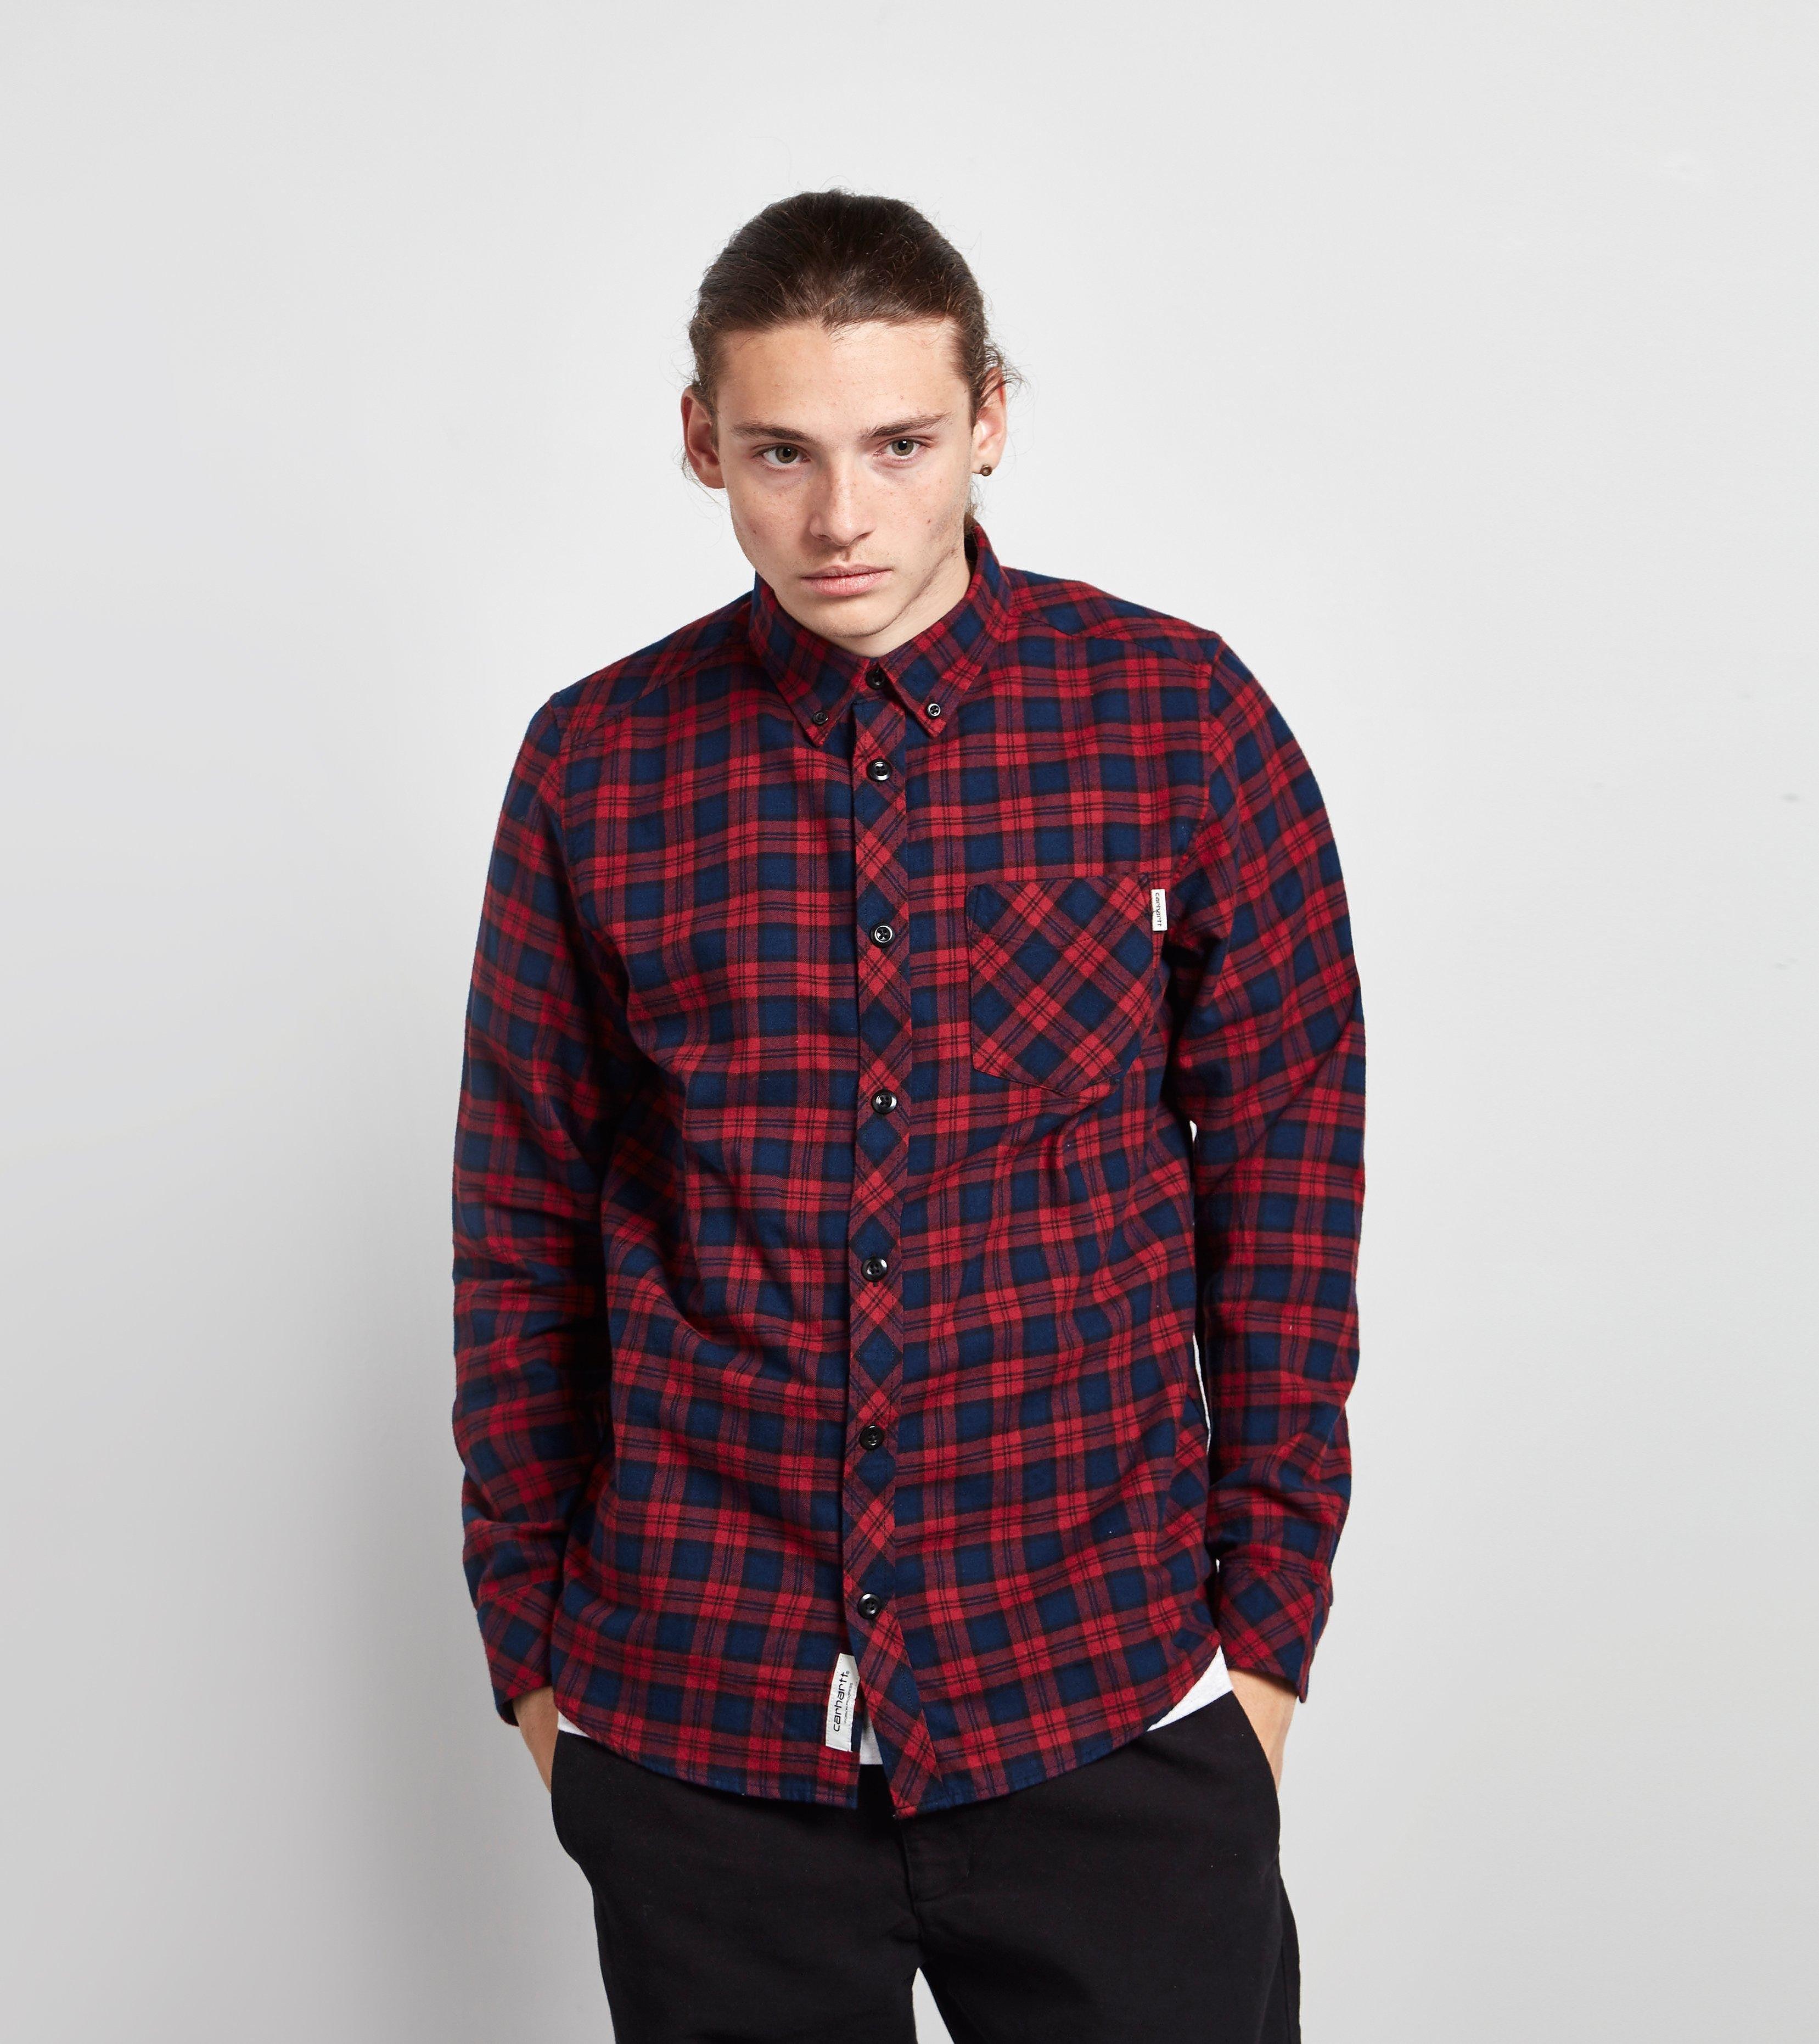 Carhartt WIP Long-Sleeved Shawn Shirt